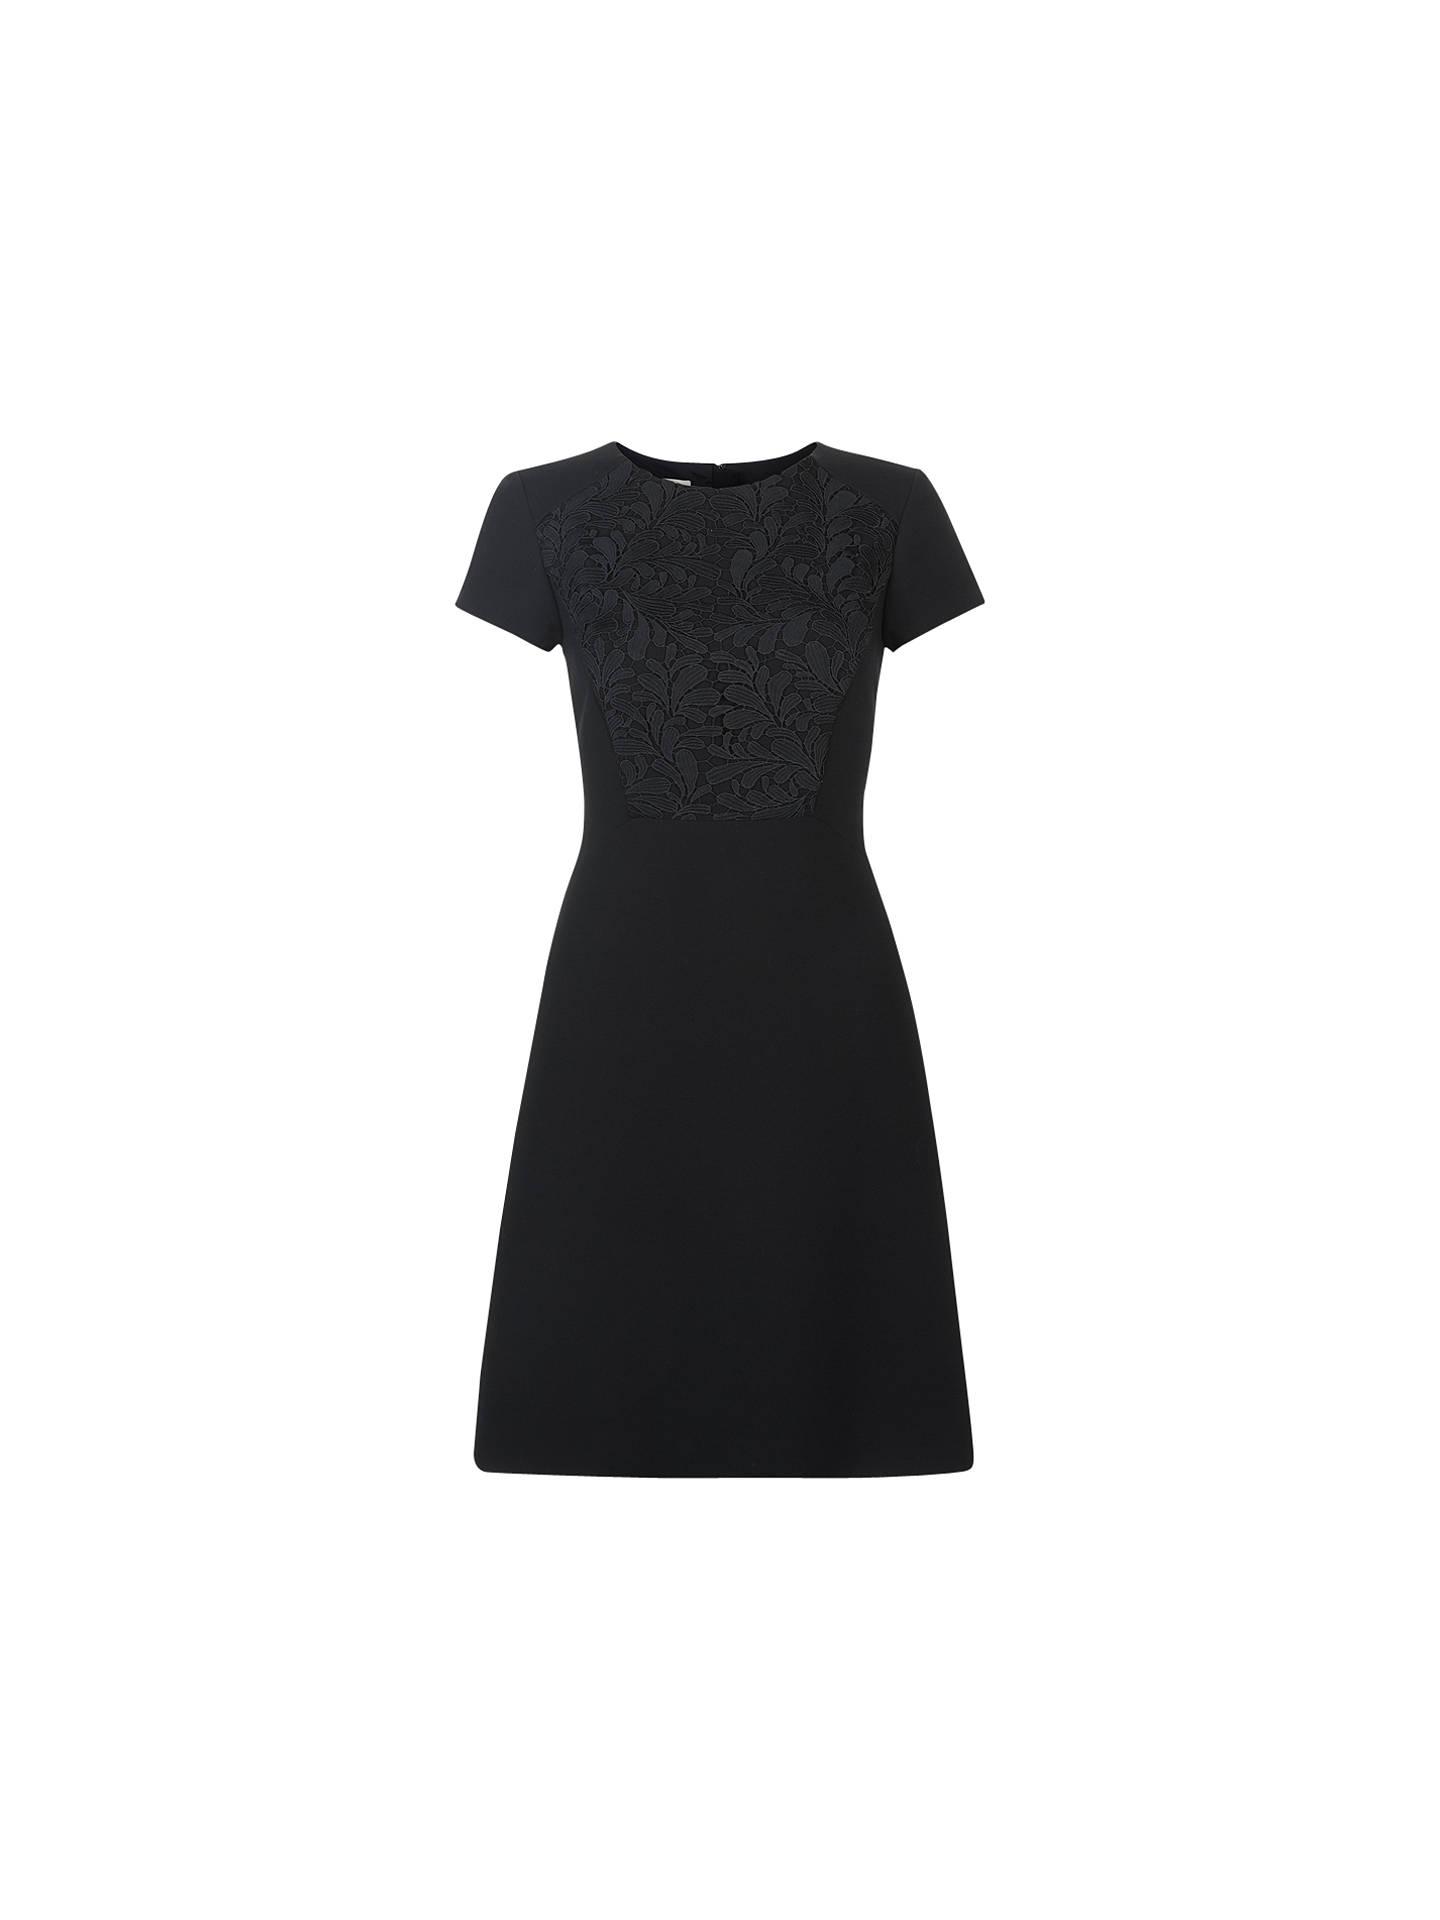 d76917c9d Buy Hobbs Cecily Dress, Black, 6 Online at johnlewis.com ...